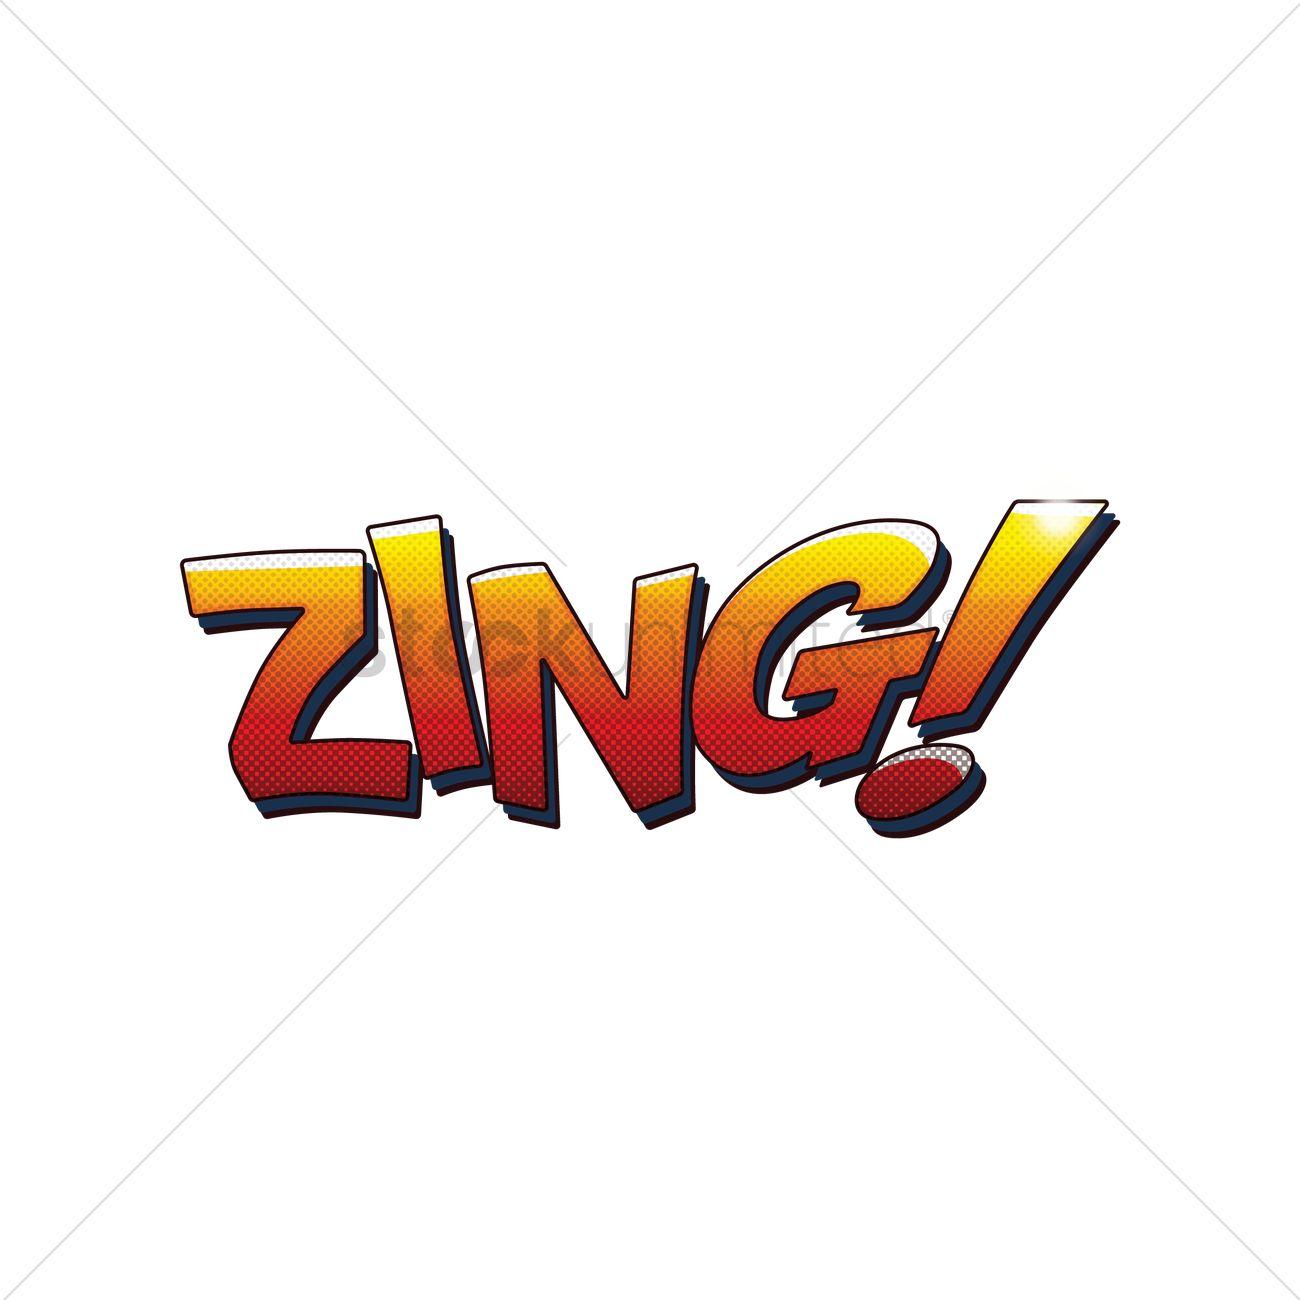 zing - photo #26